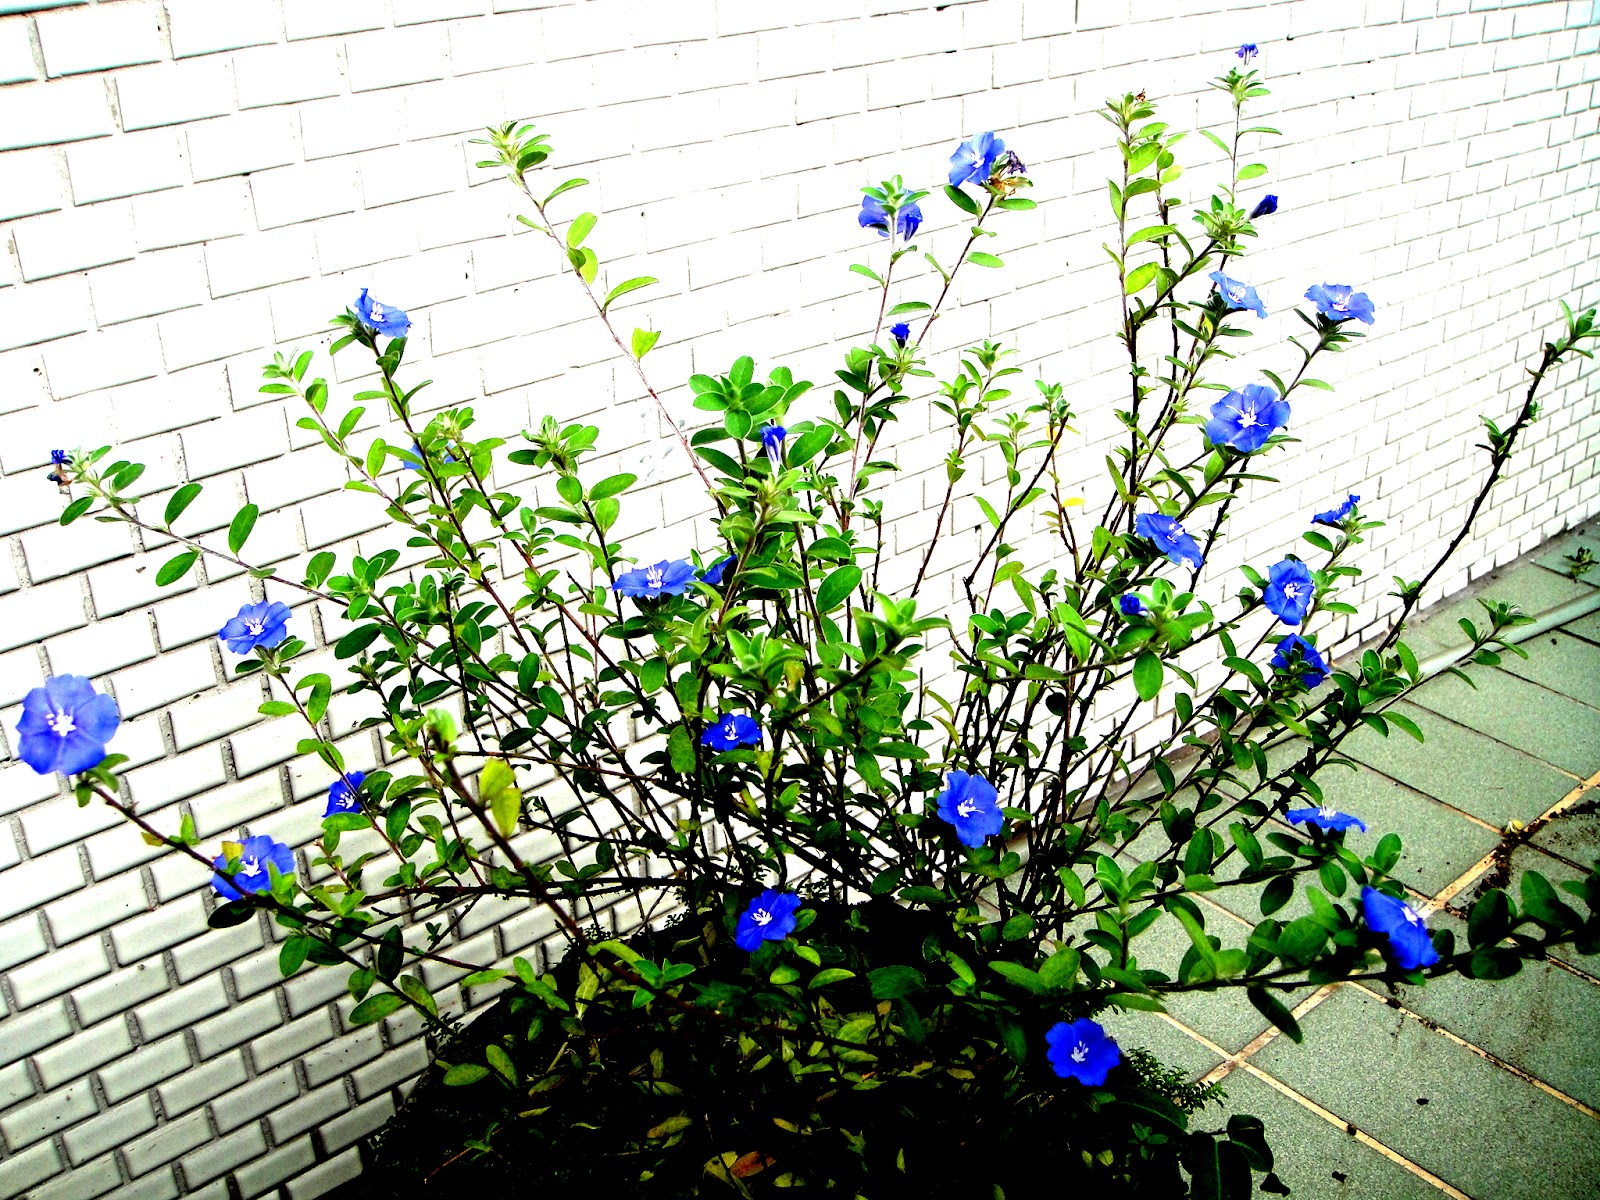 DWAN雲之端: 藍星花--Blue Daze--Hawaiian blue Eyes--好種,似傘狀的小藍花, 是旋花科多年生木本植物 。 有太陽的日子,花冠藍色,在冬季要注意保溫。冬天要減少澆水次數,土壤要疏鬆肥沃,愛開花--藍星花語:把握現在--想種花者的首選--藍星花開啟 ...